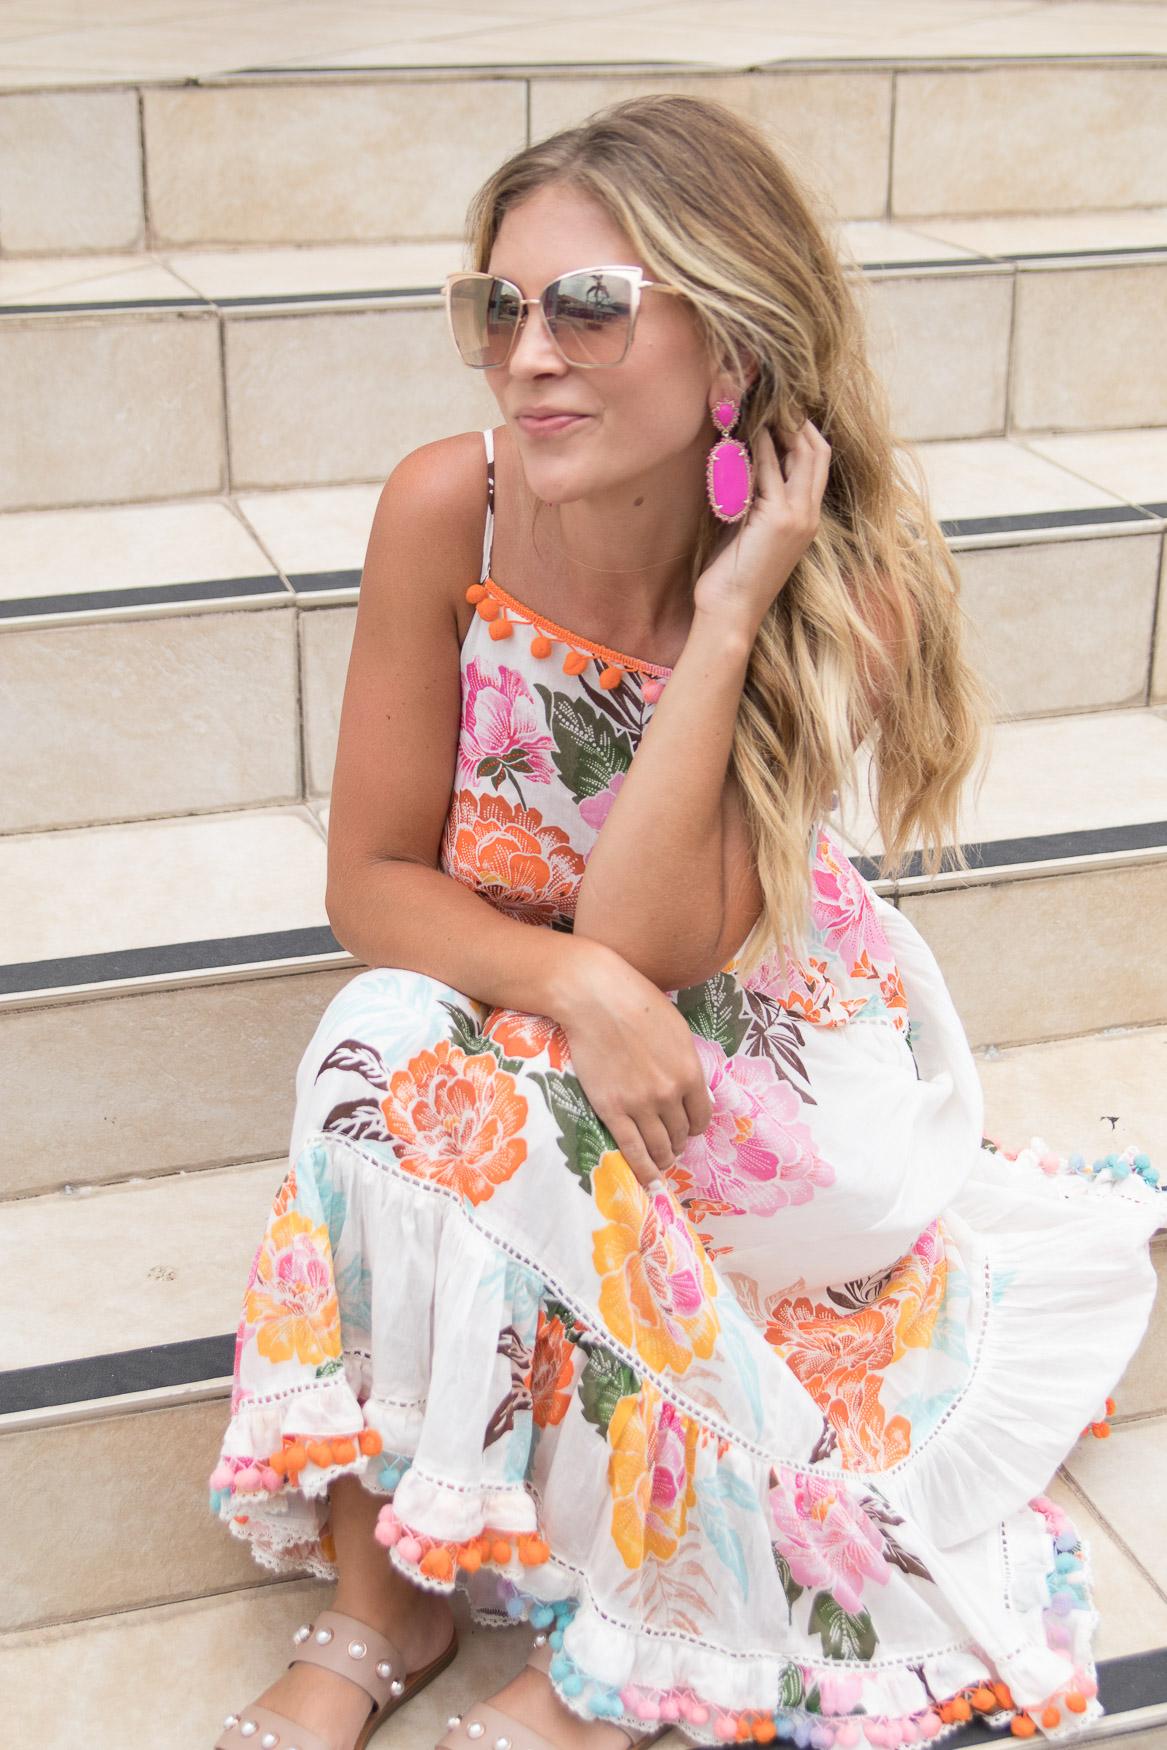 Floral Pom Pom Anthropologie Dress Colorful St. Kitts